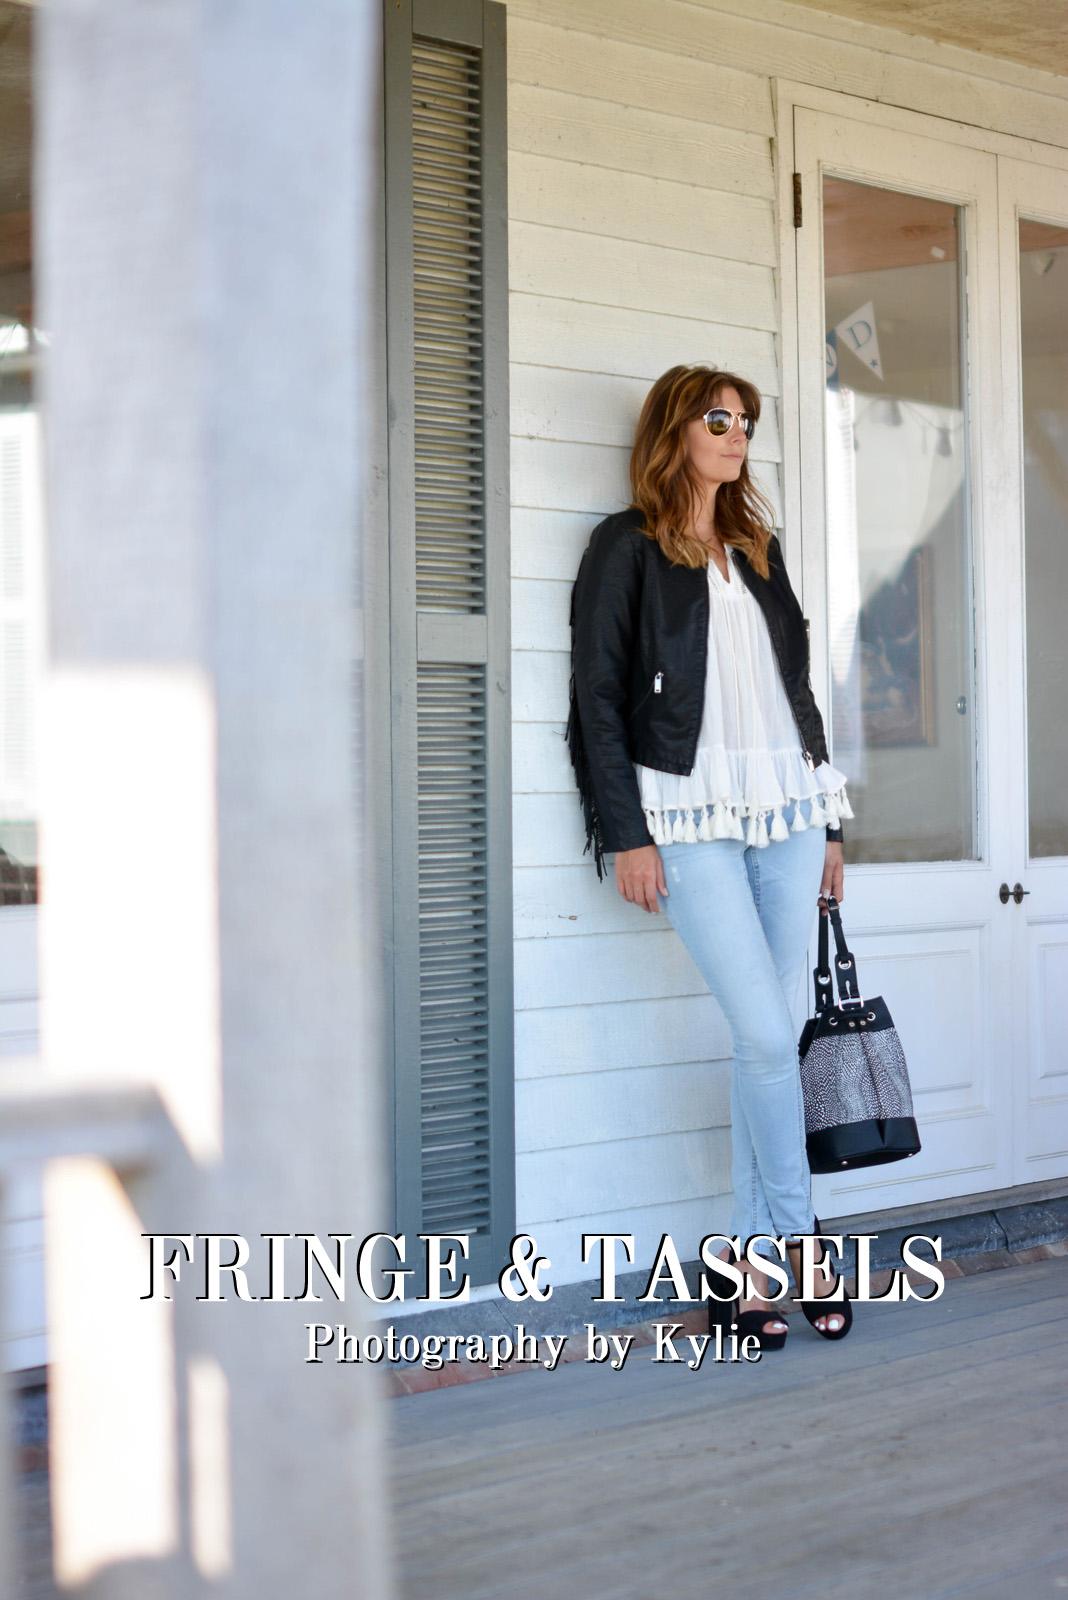 EJSTYLE - Emma Hill wears black tassel fringe leather jacket, tassel trim tunic top, bleach wash skinny jeans, black suede platform sandals, black grey snake bucket bag, aviator sunglasses, OOTD, title